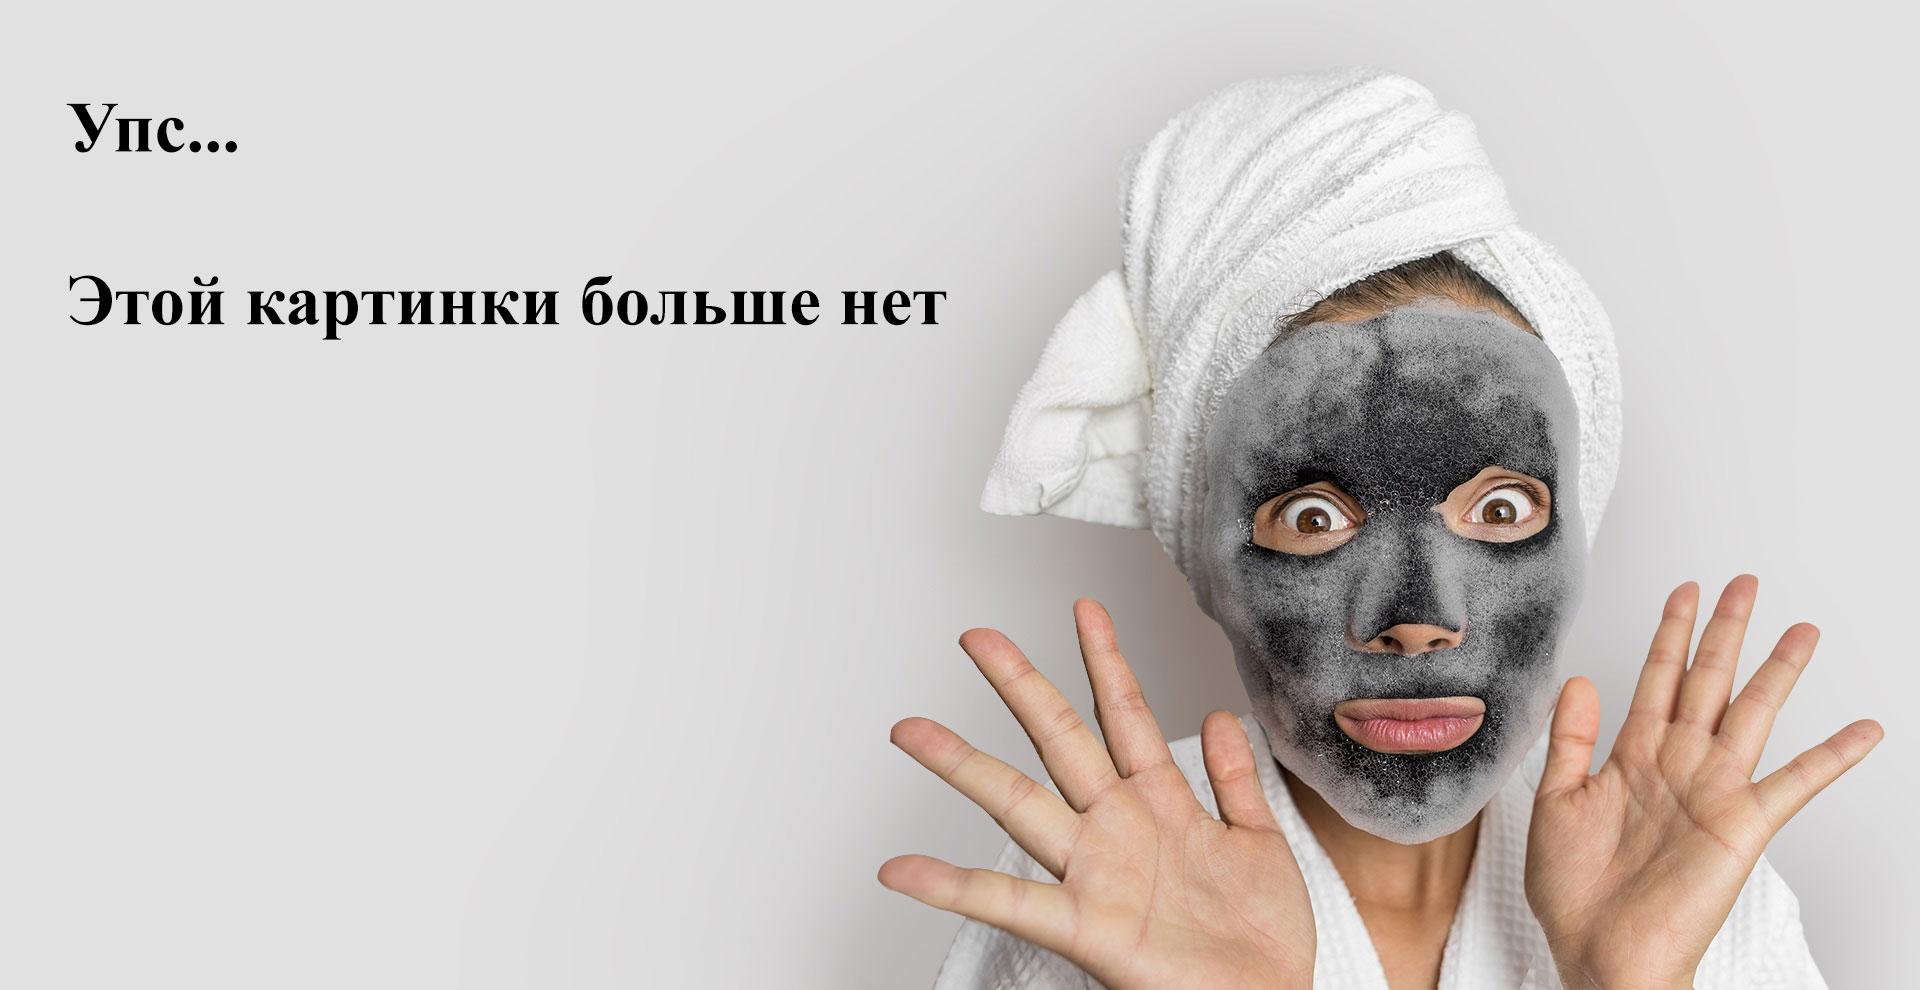 Masura, Гель-лак «Кошачий глаз» №295-26M, Лавандовый Жемчуг